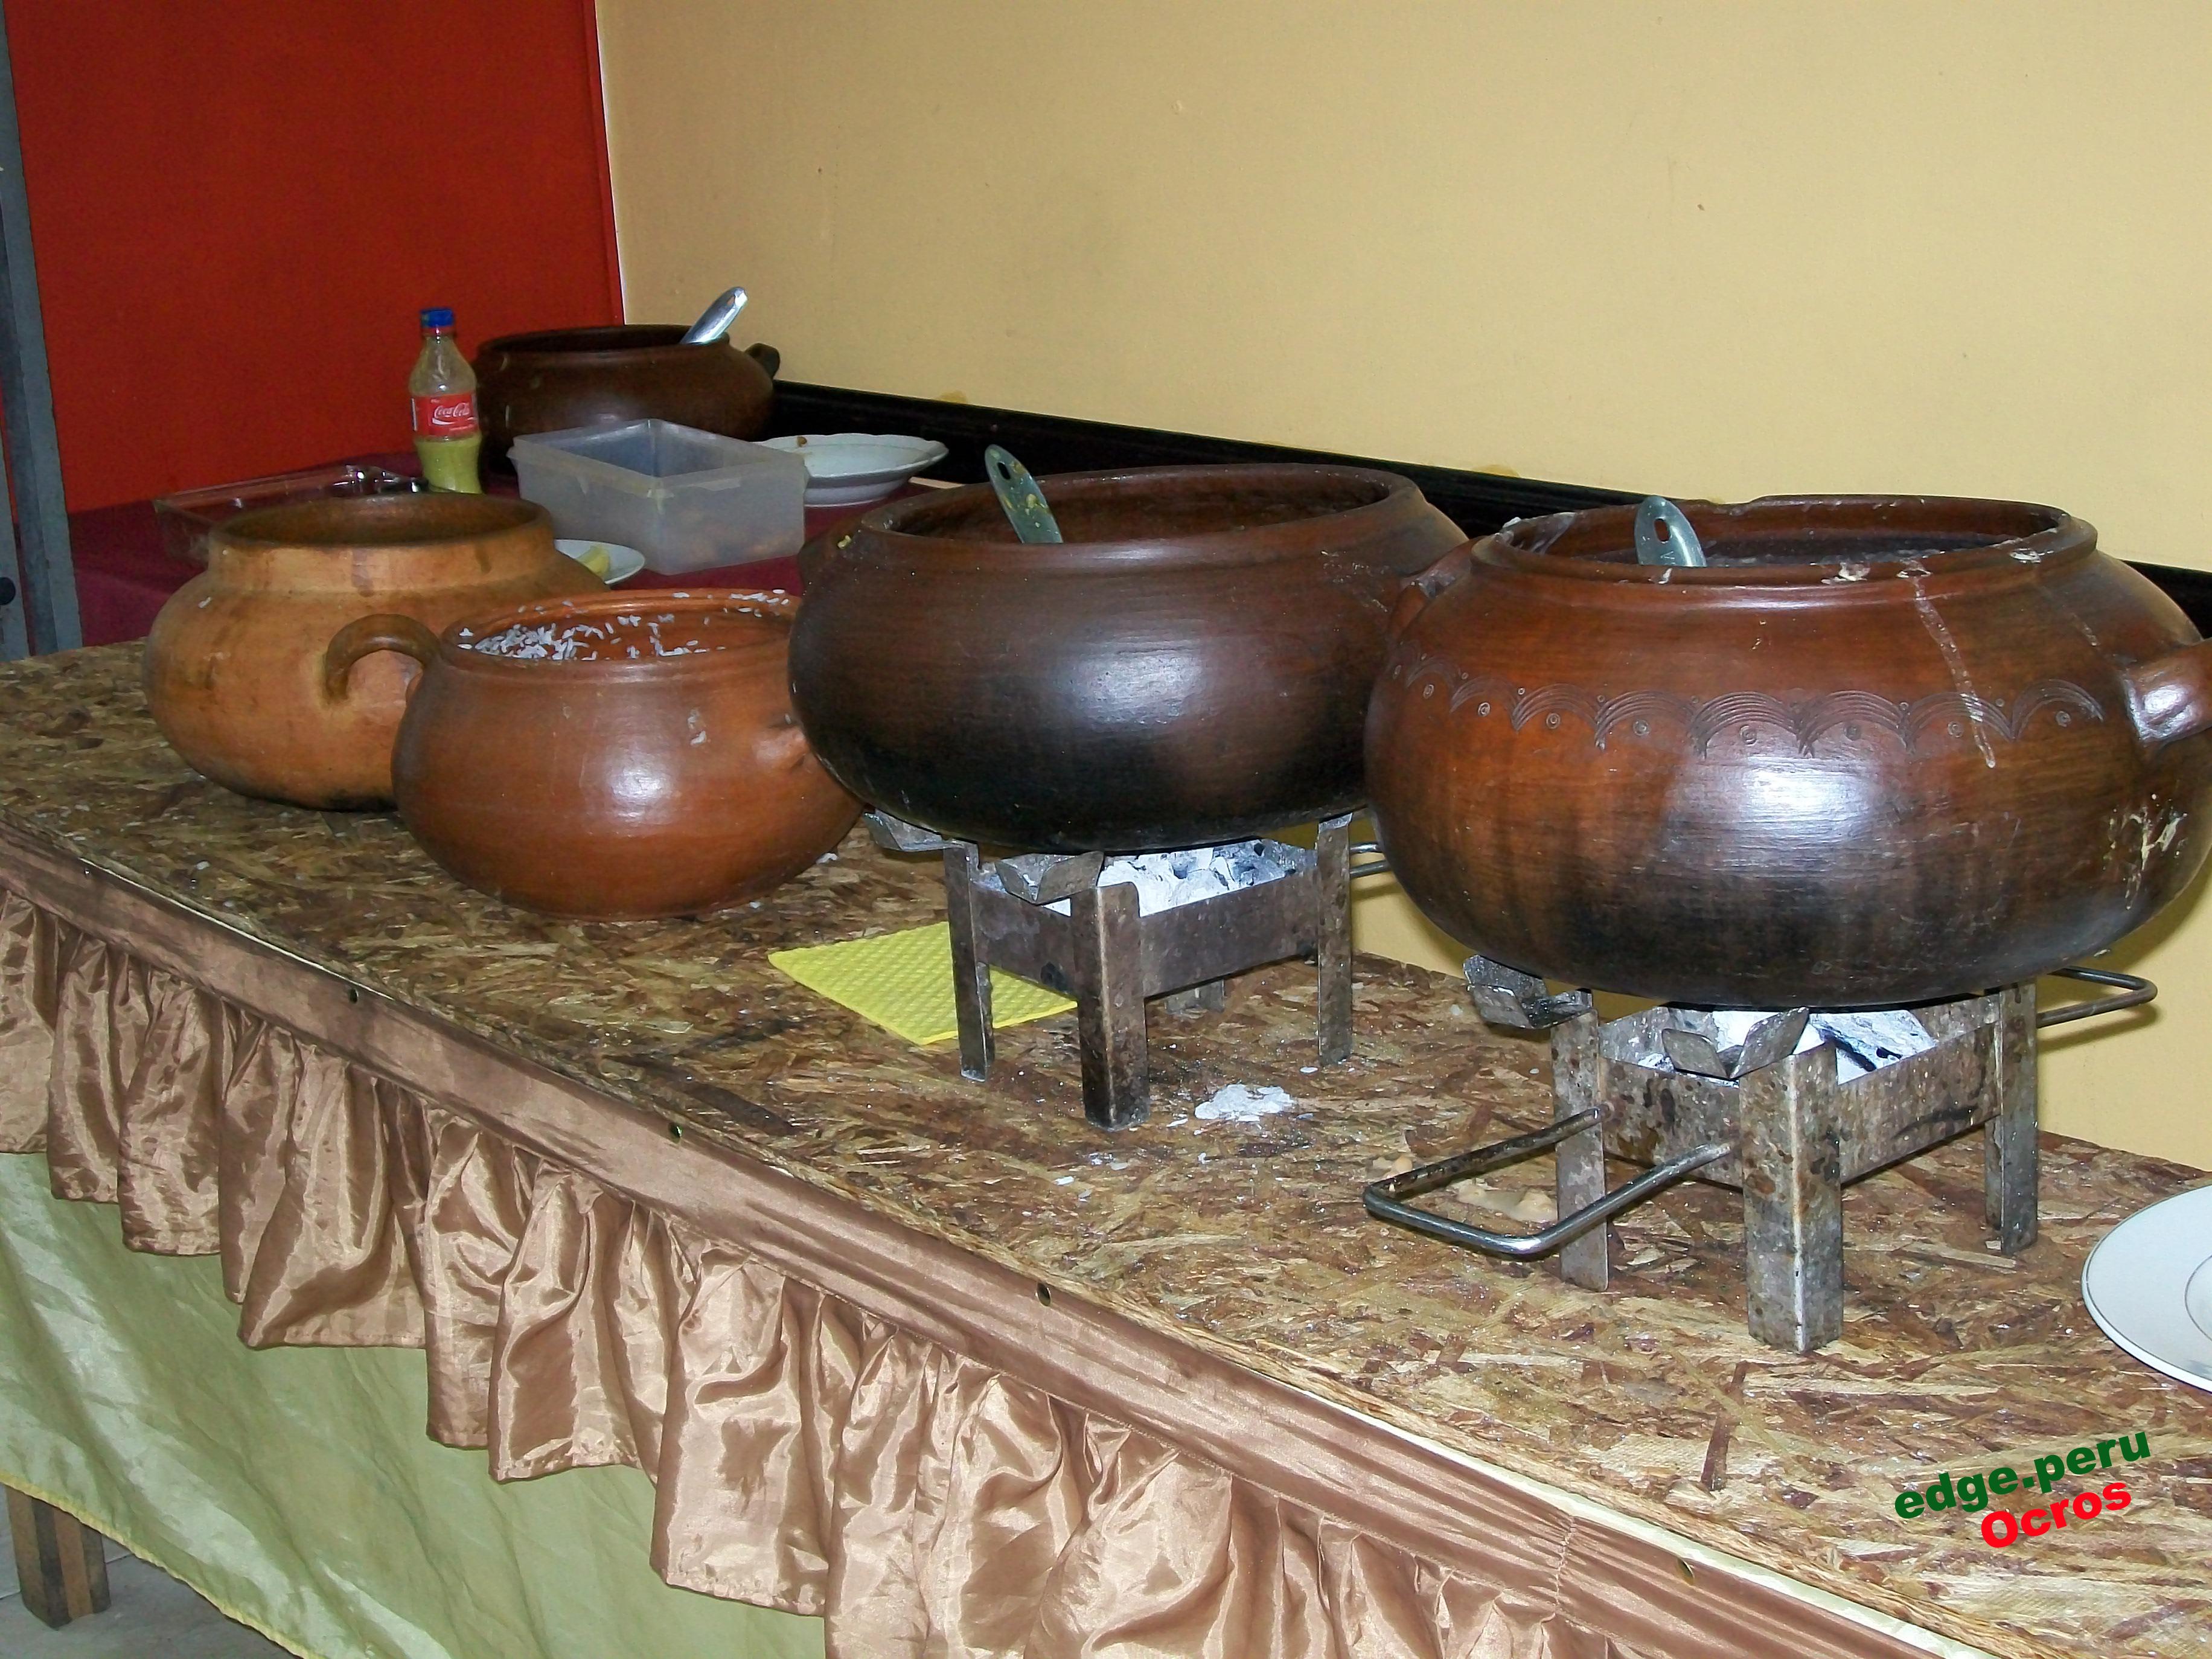 Utensilios de cocina cerawiki for Utensilios de cocina de ceramica